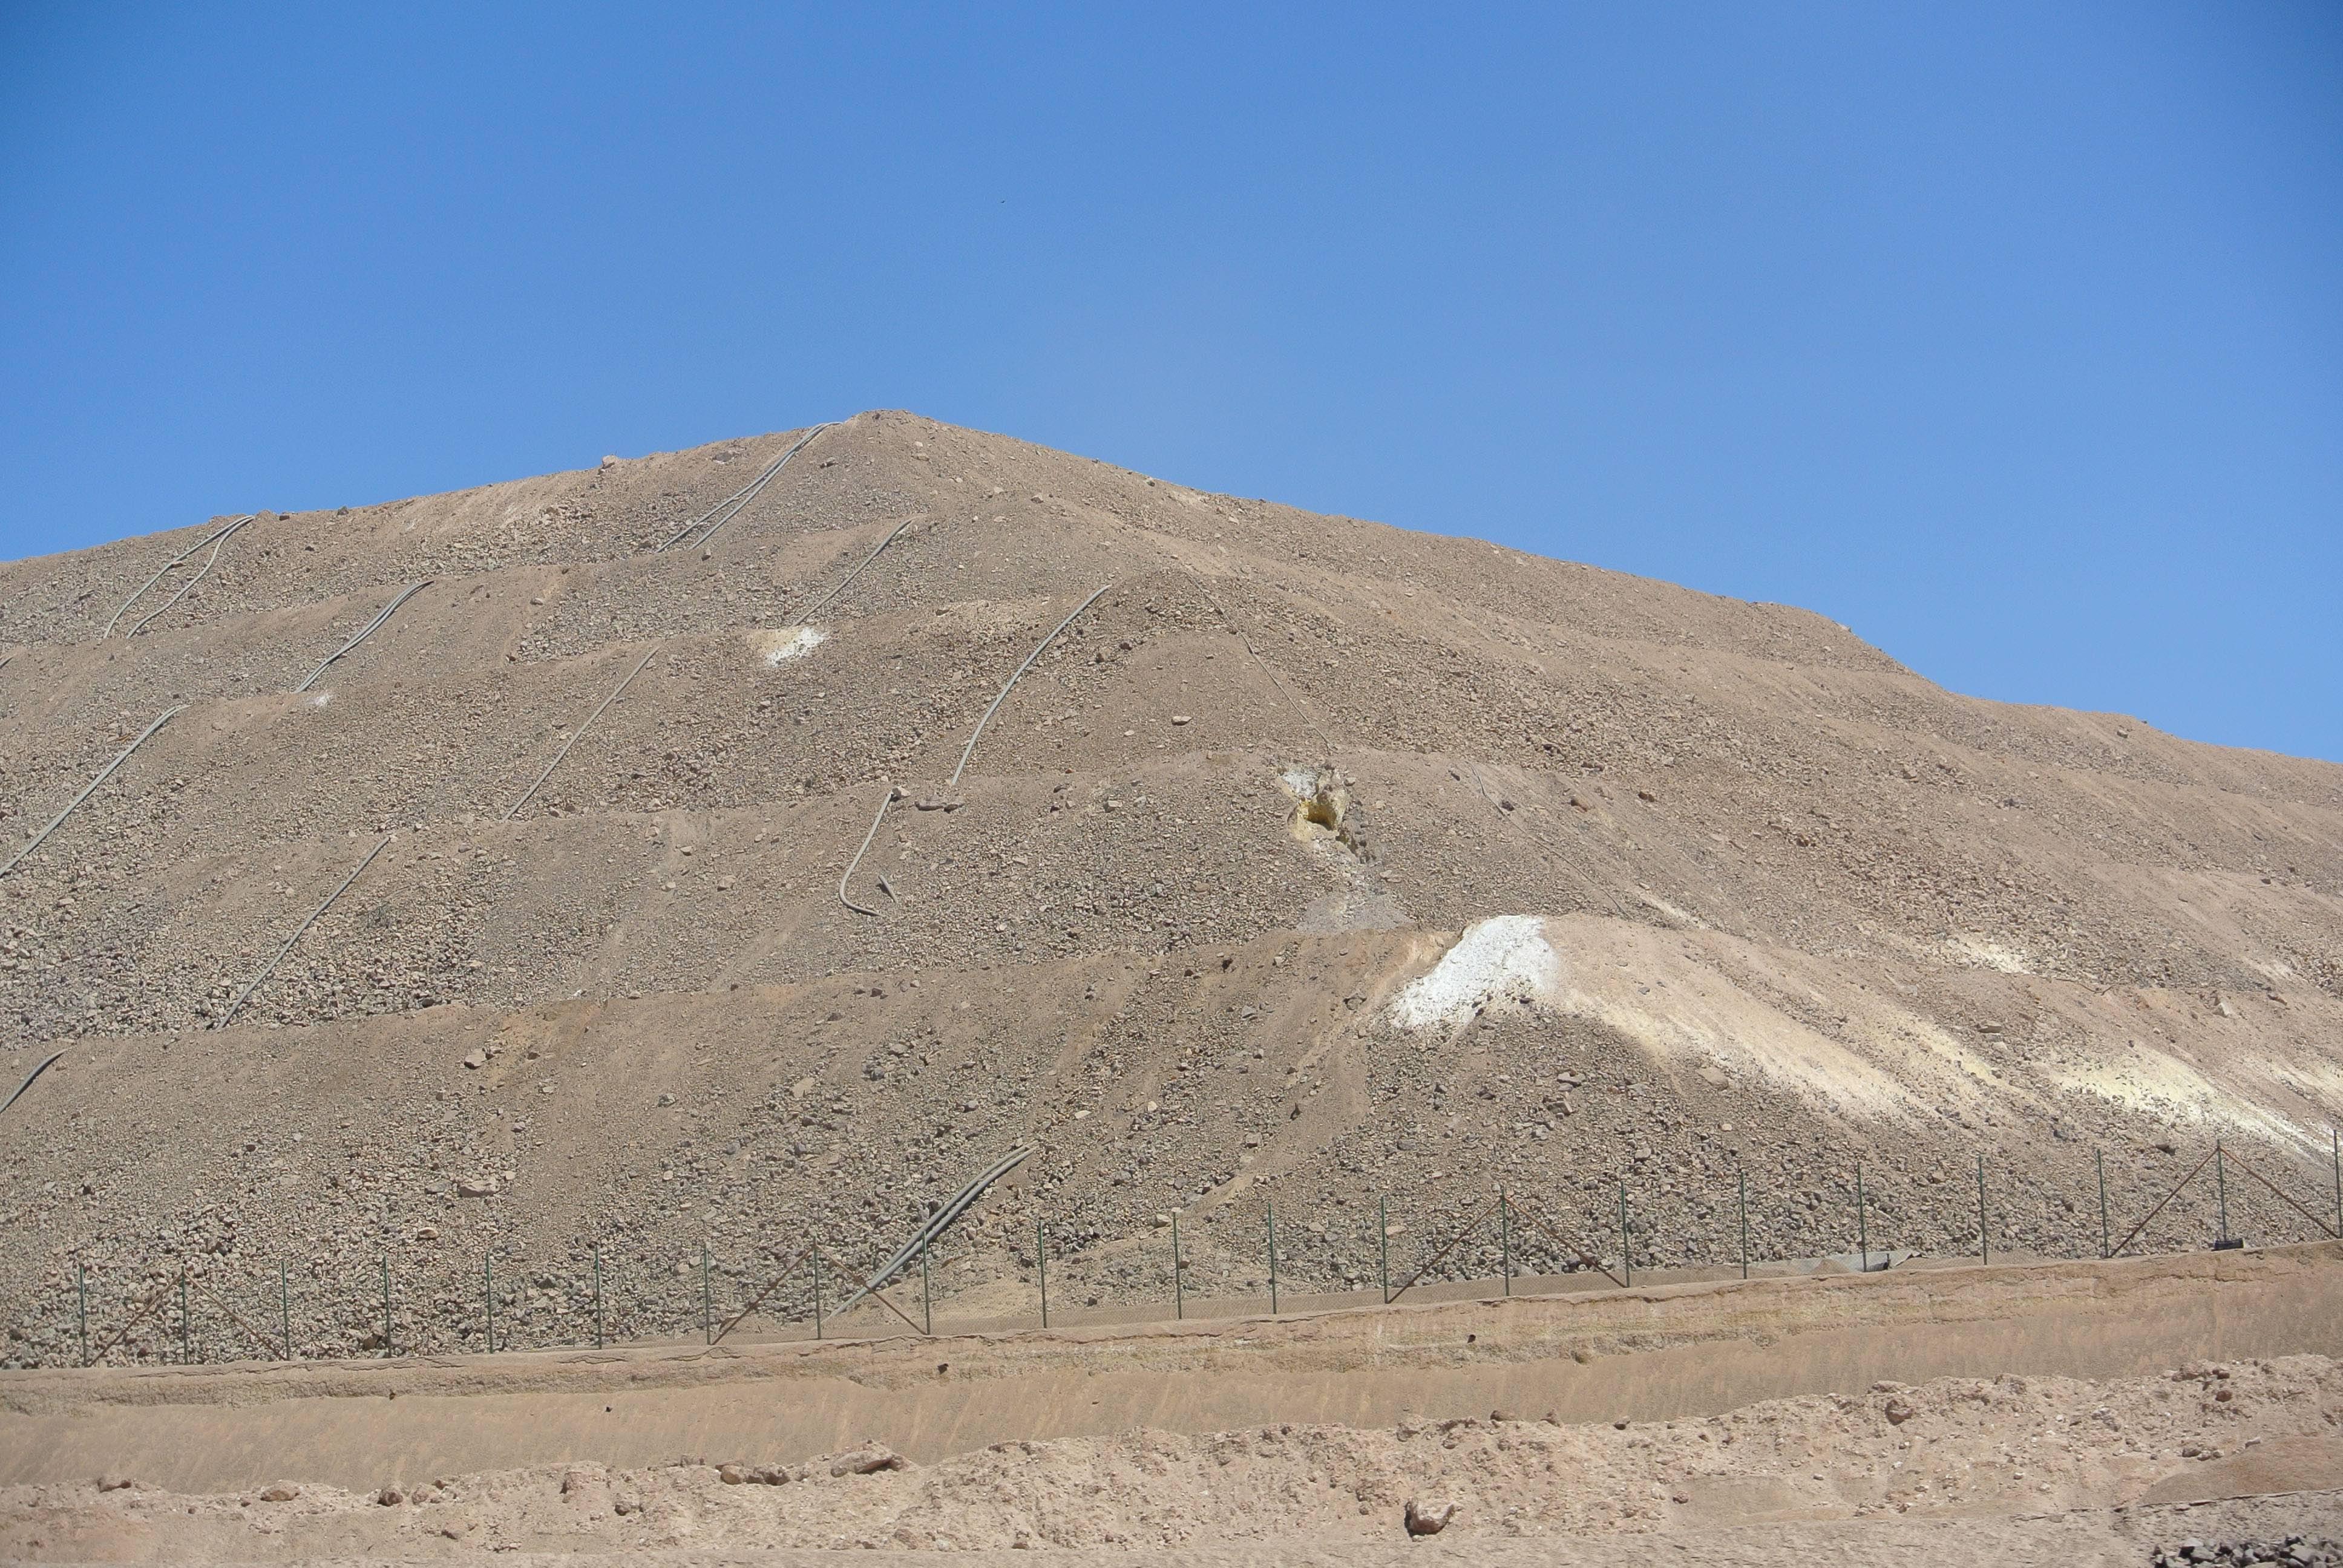 019 1612 Antofagasta 5jpeg